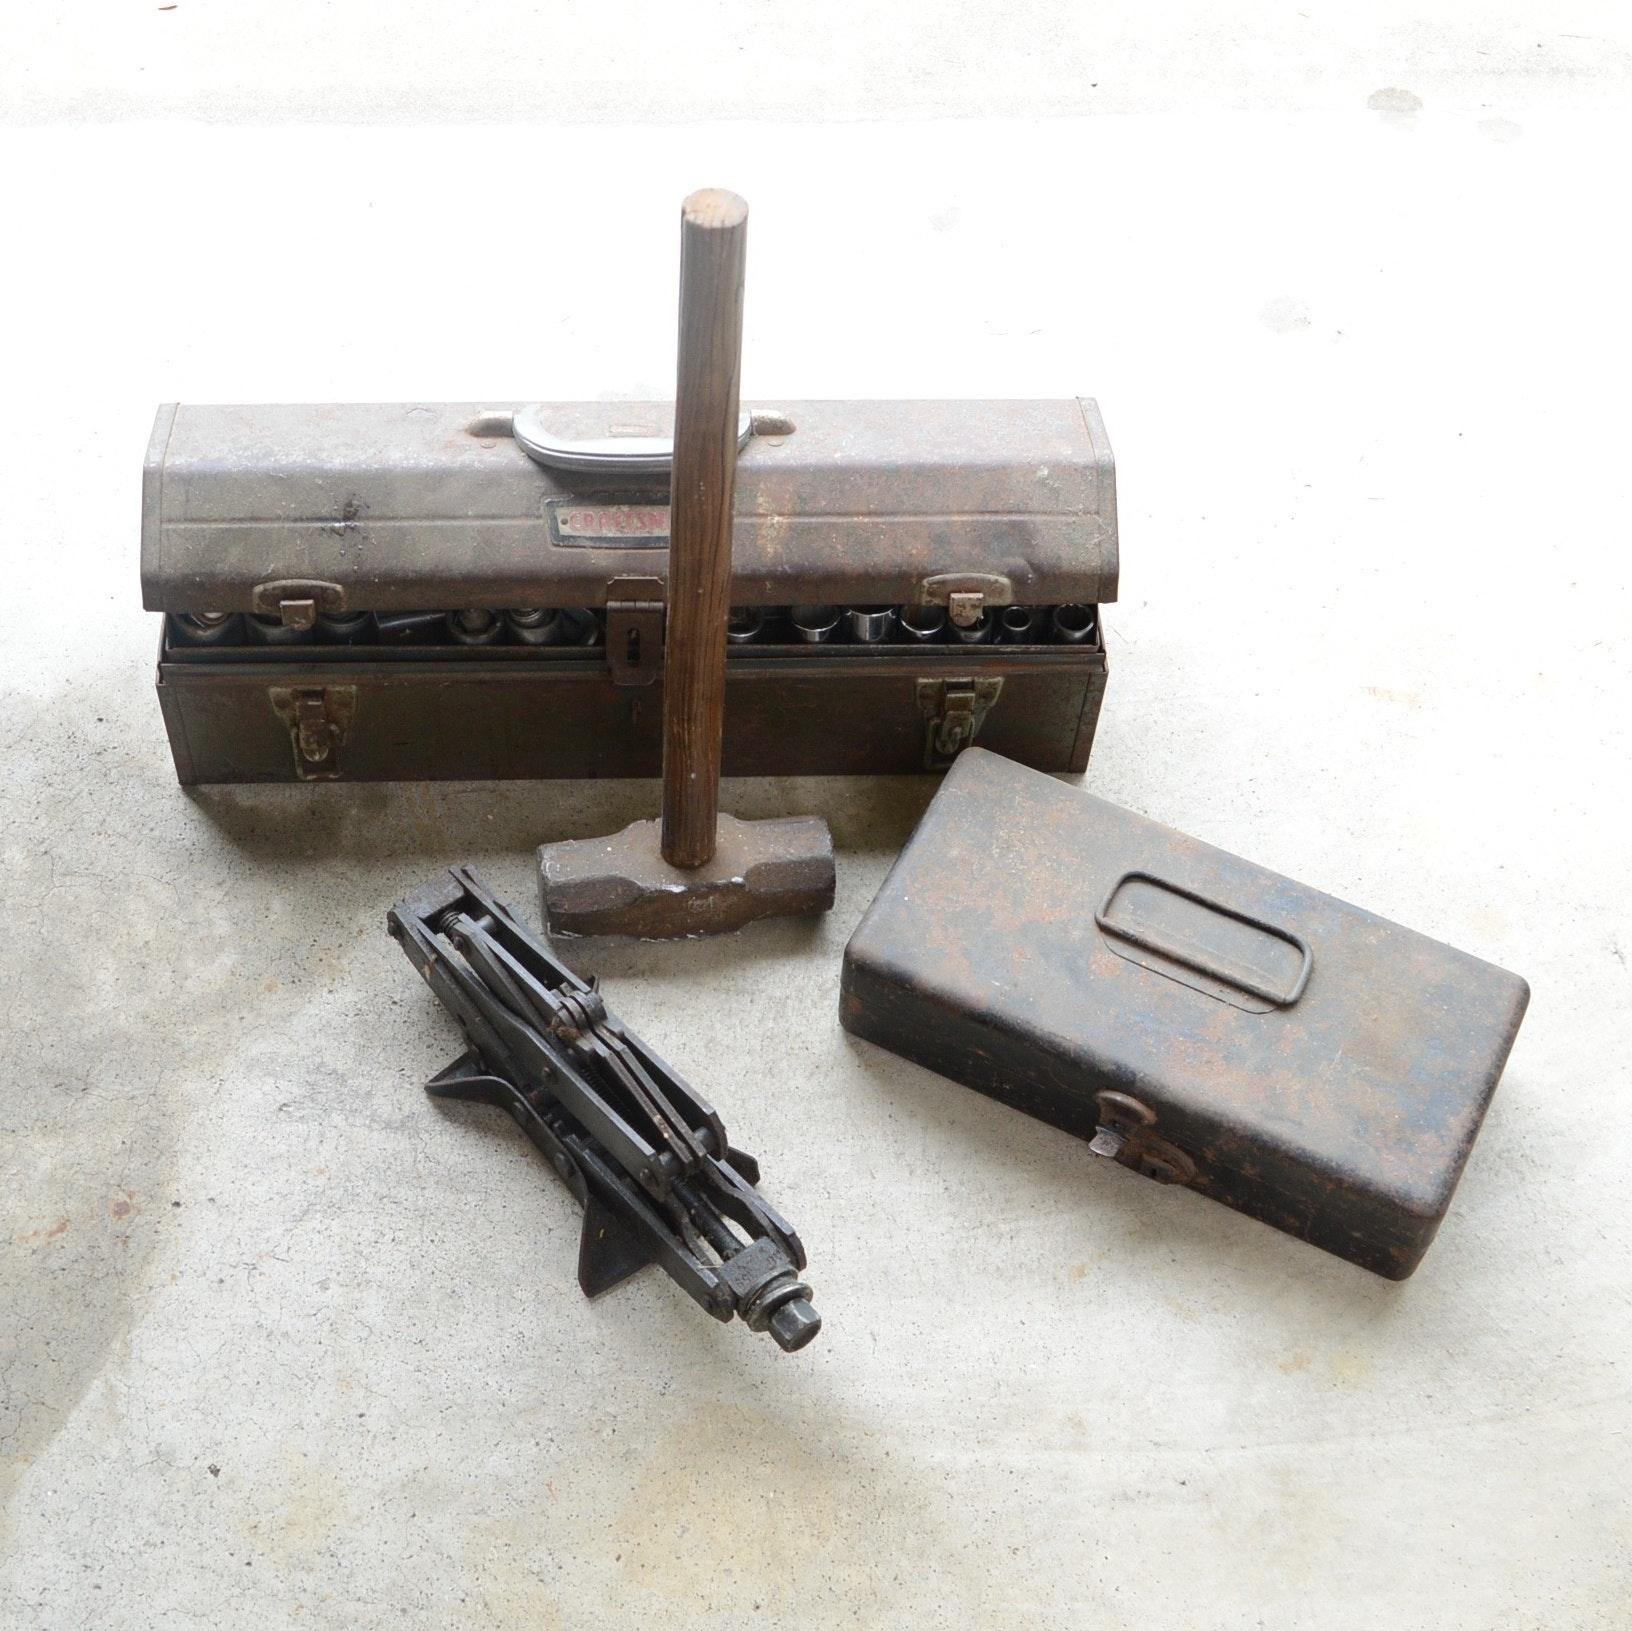 Metal Tool Box, Car Jack and Sledgehammer